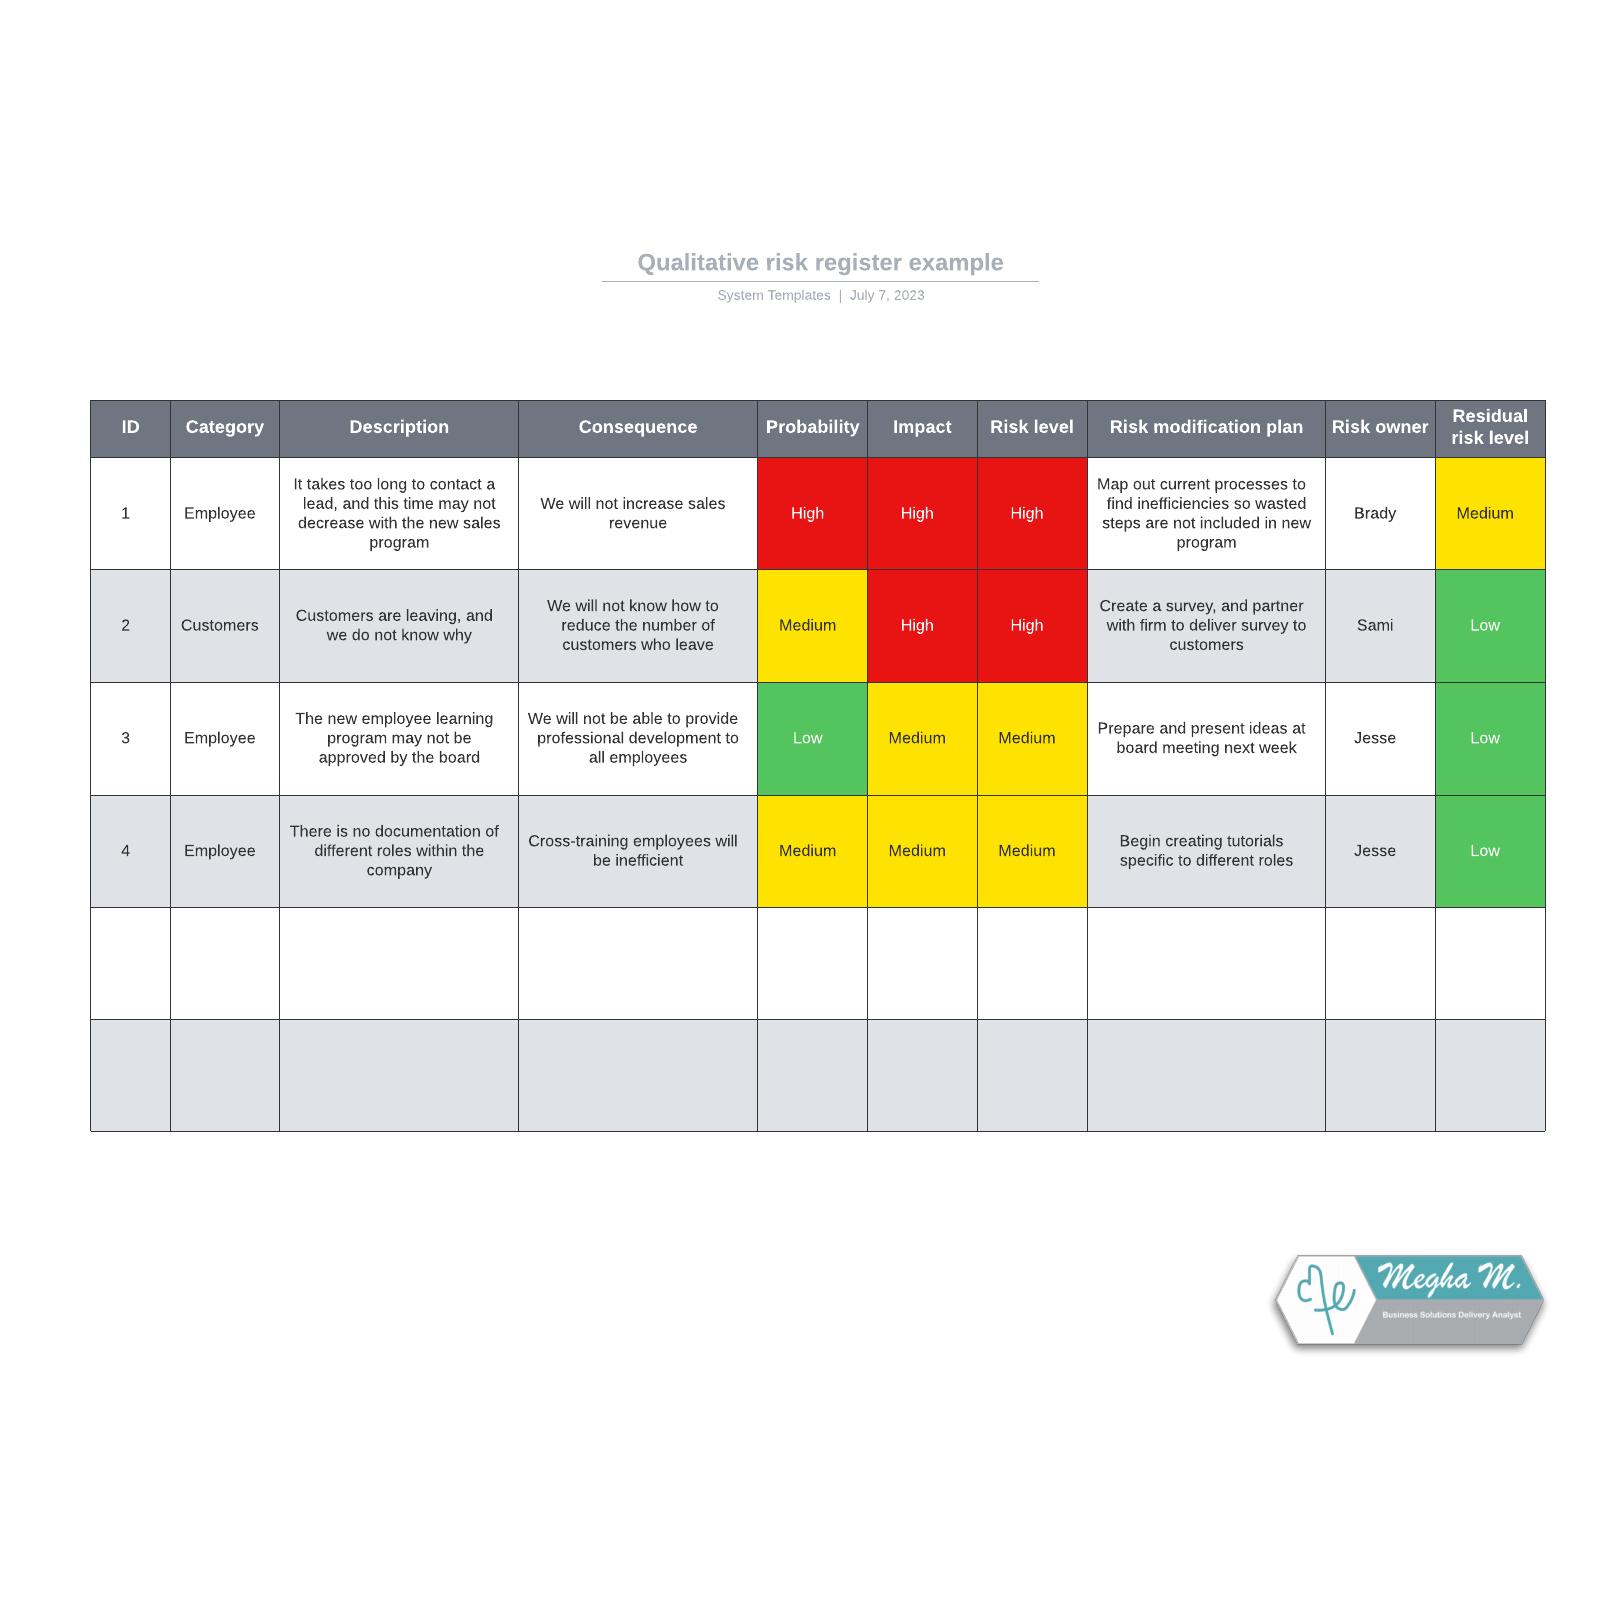 Qualitative risk register example